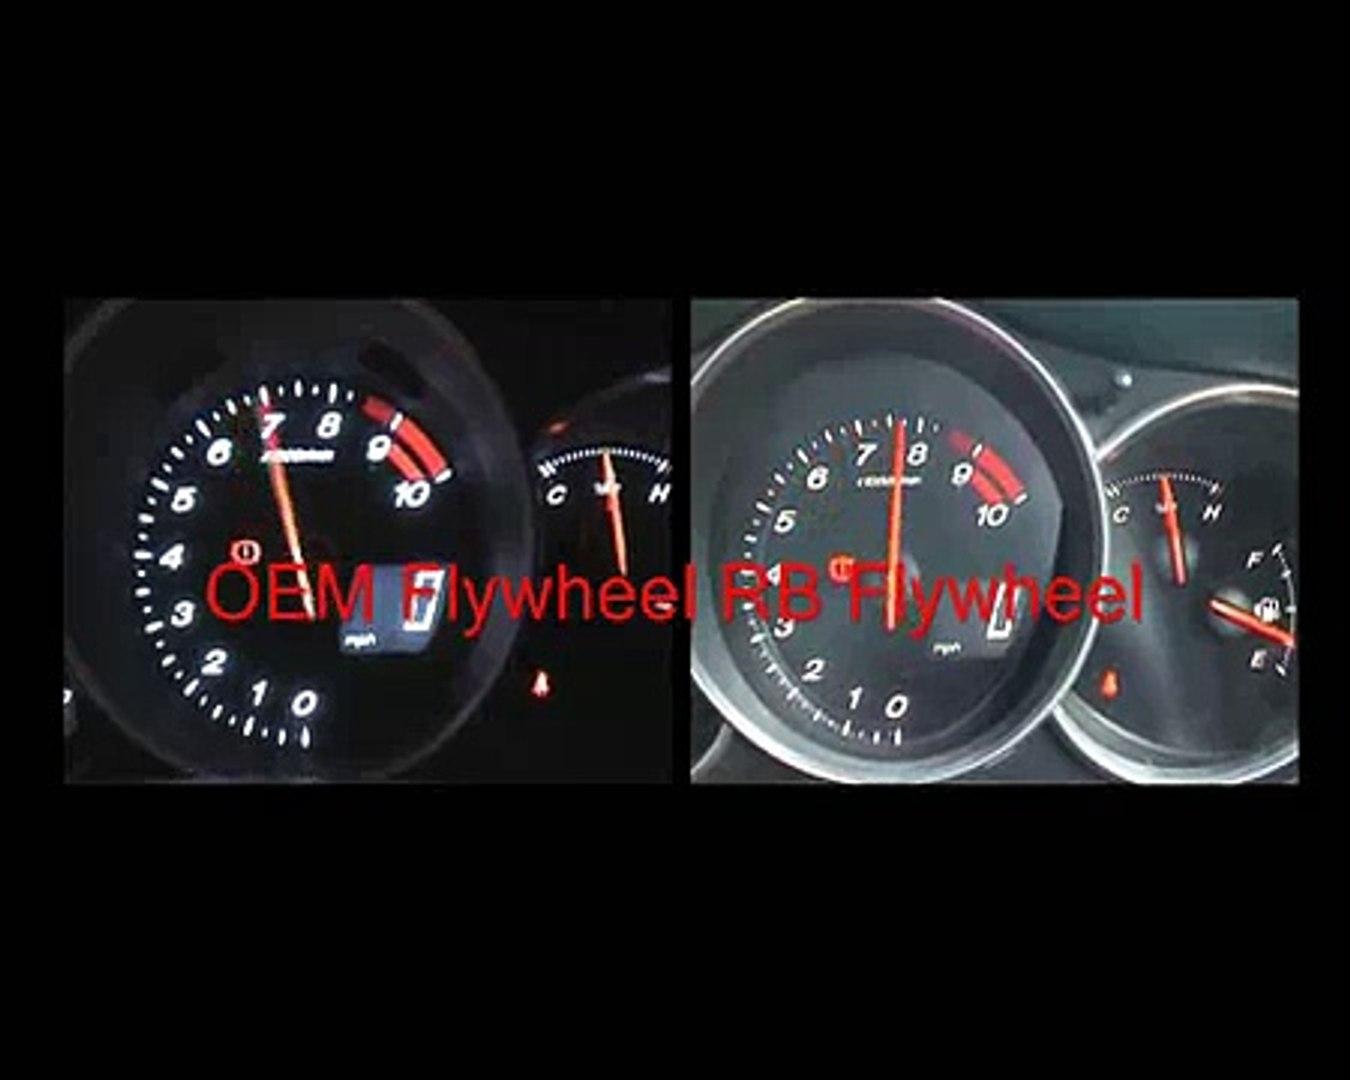 RX8 Flywheel Comparison